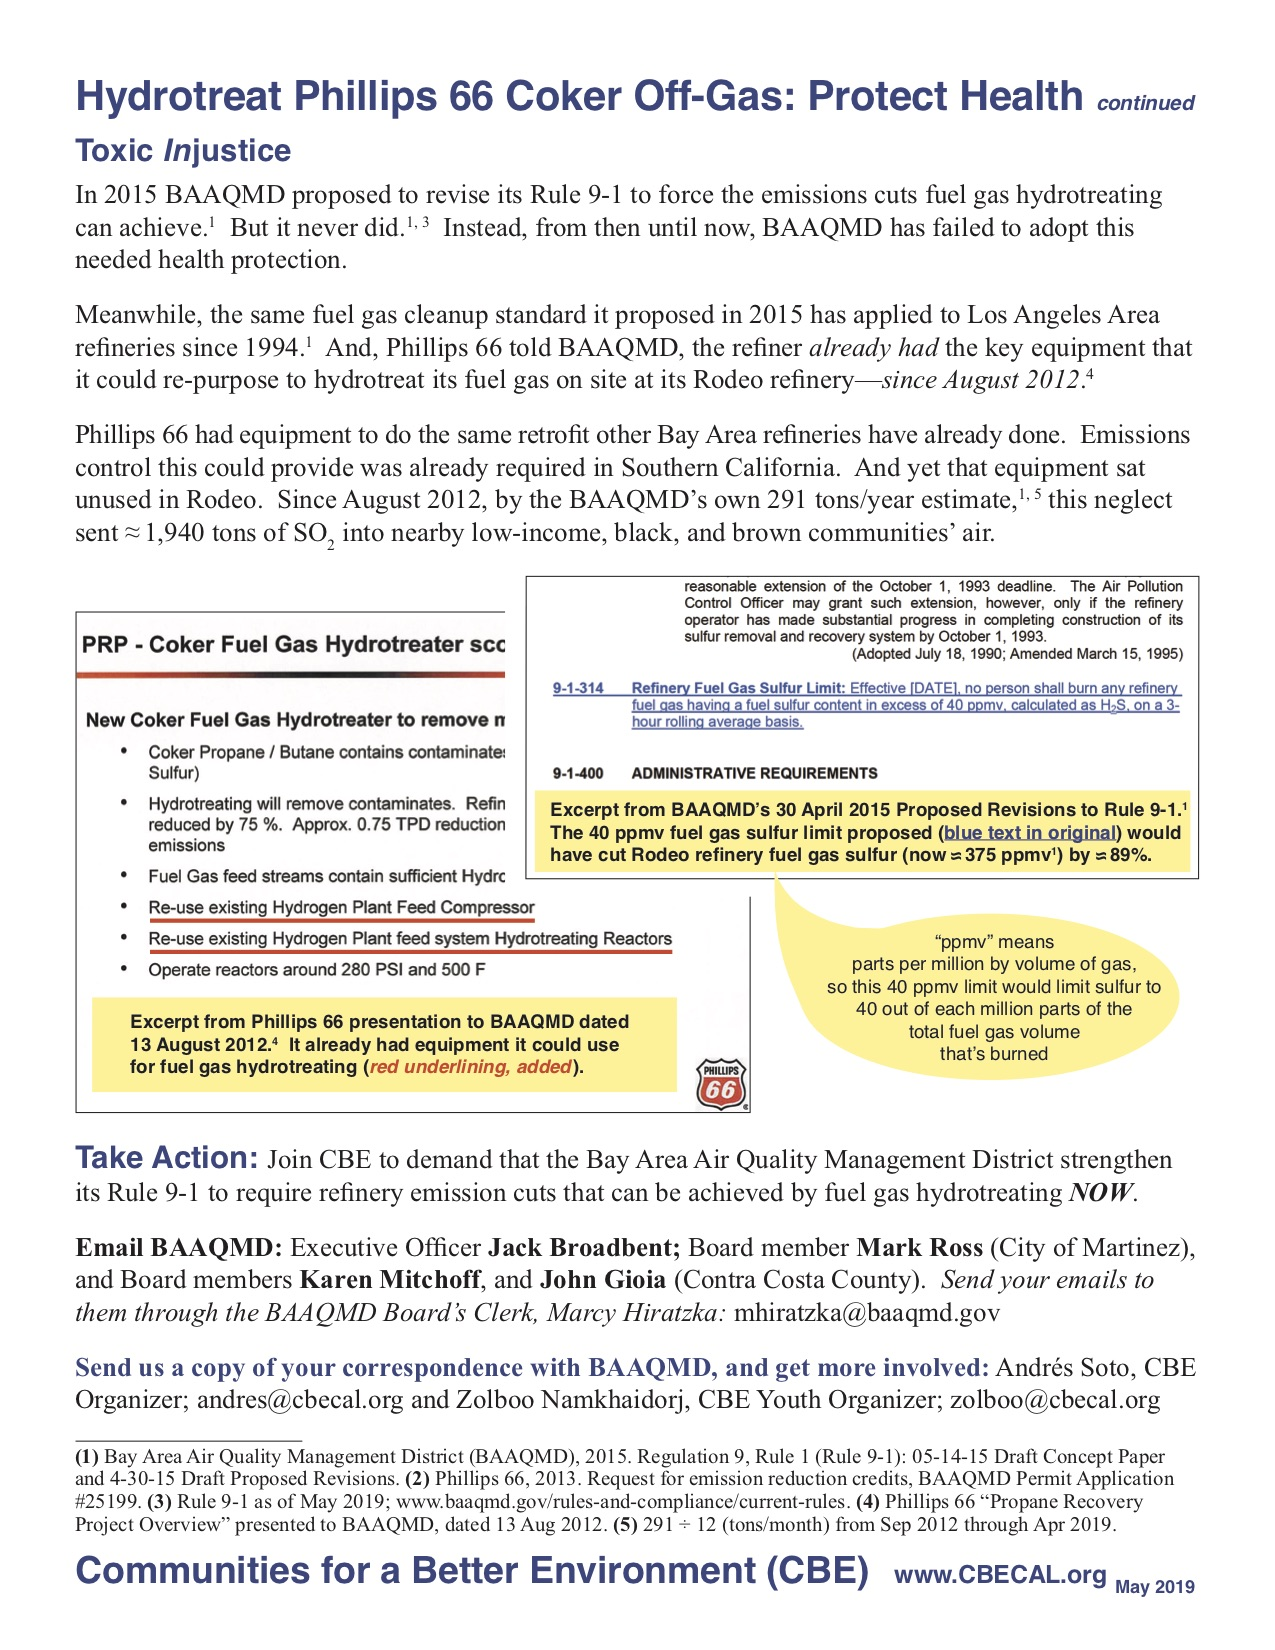 Refinery Fuel Gas Rule Factsheet 2.jpg